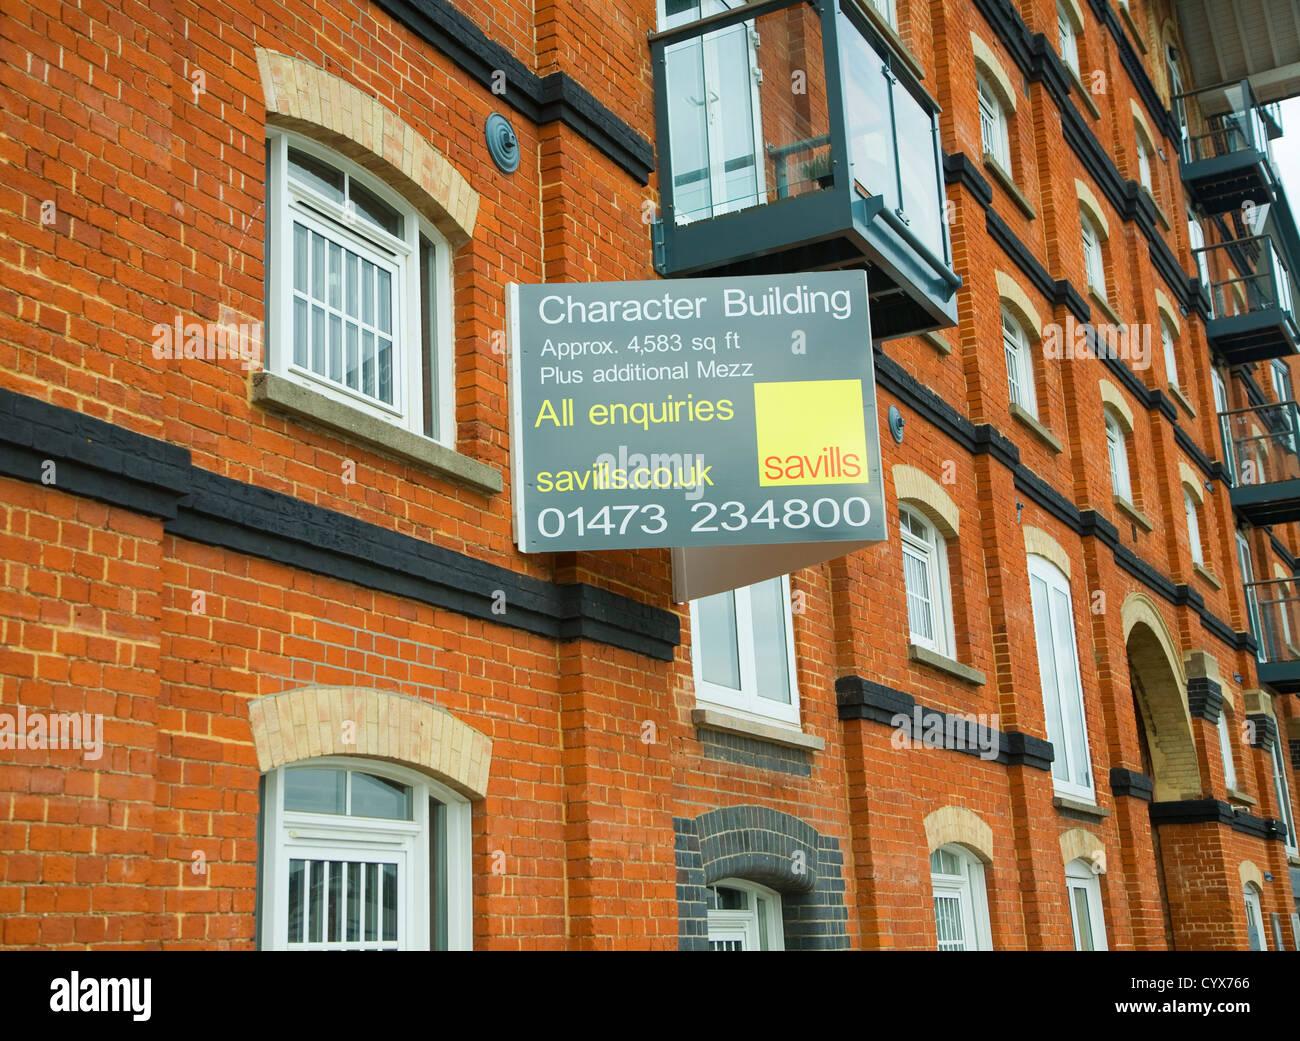 Savills estate agent sign converted industrial waterside character building Ipswich wet dock, Suffolk, England - Stock Image